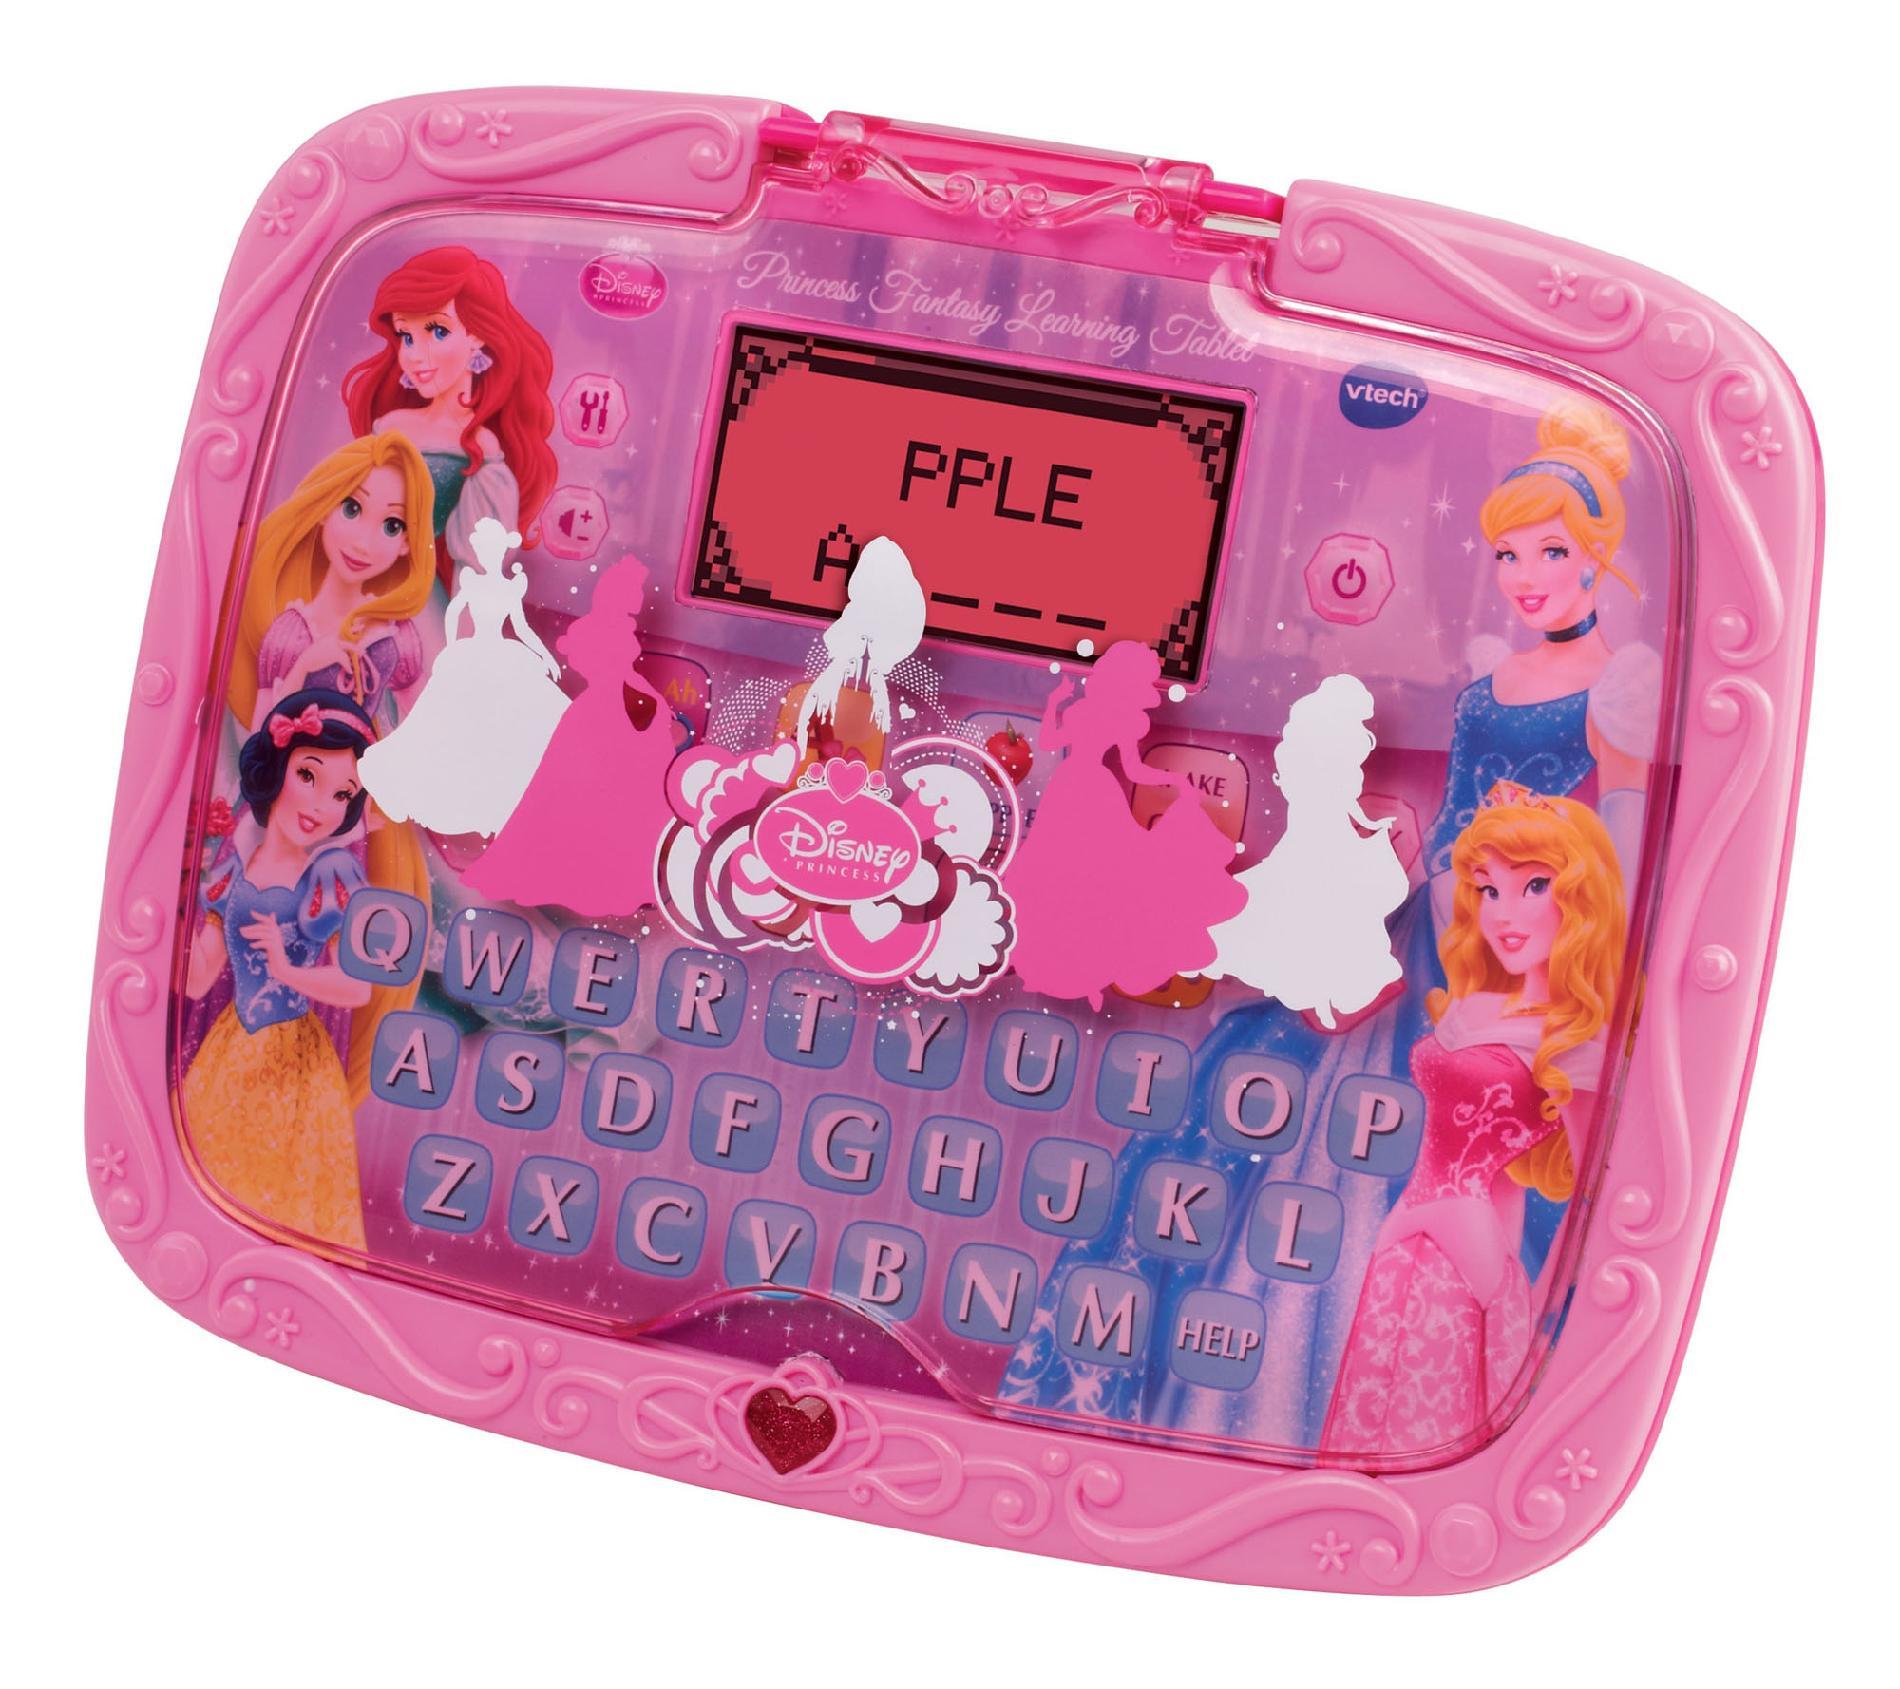 Vtech Disney Princess Fantasy Learning Tablet Toys